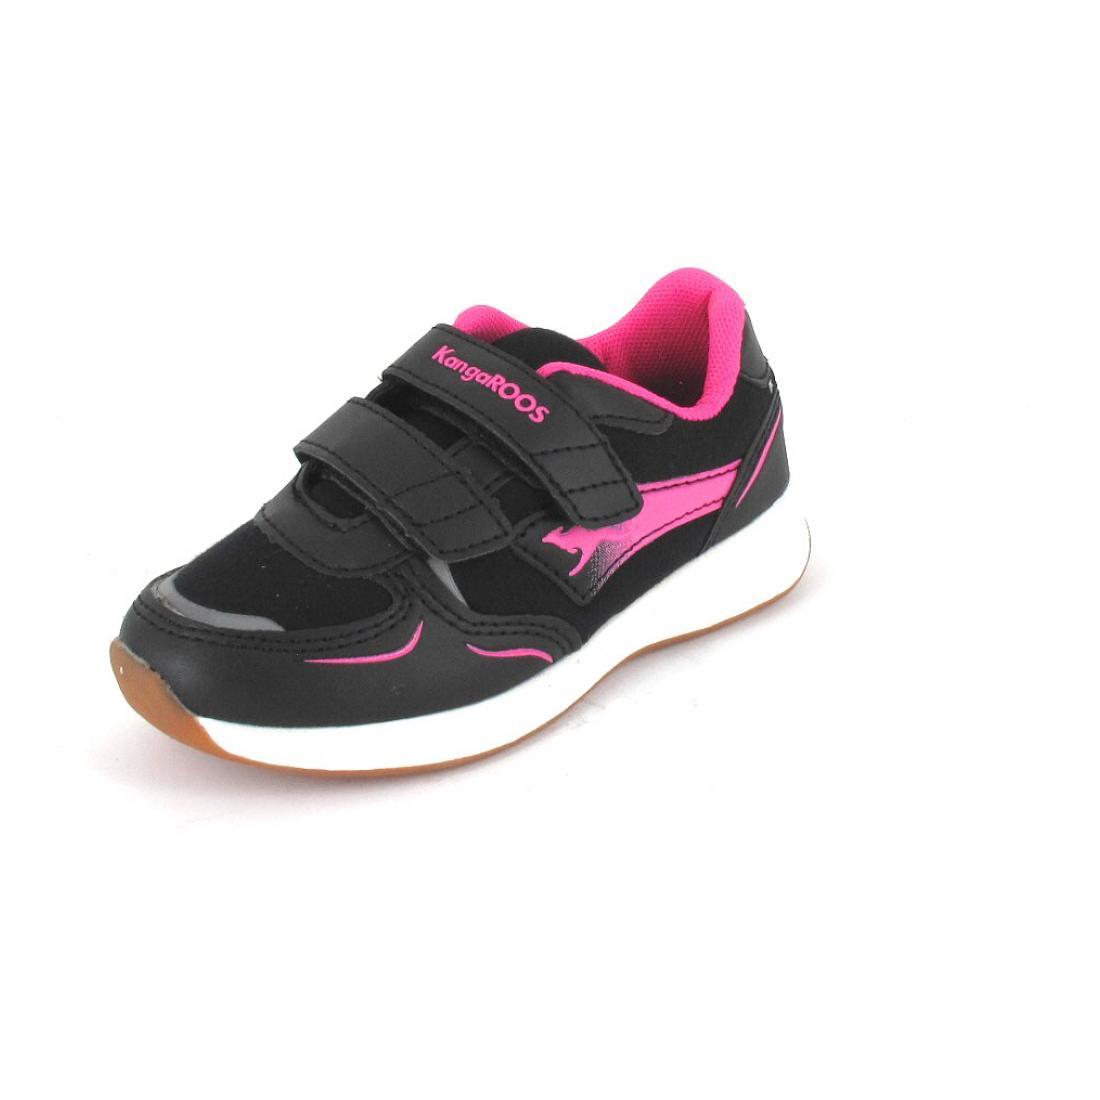 KangaRoos Sneaker Roji II V